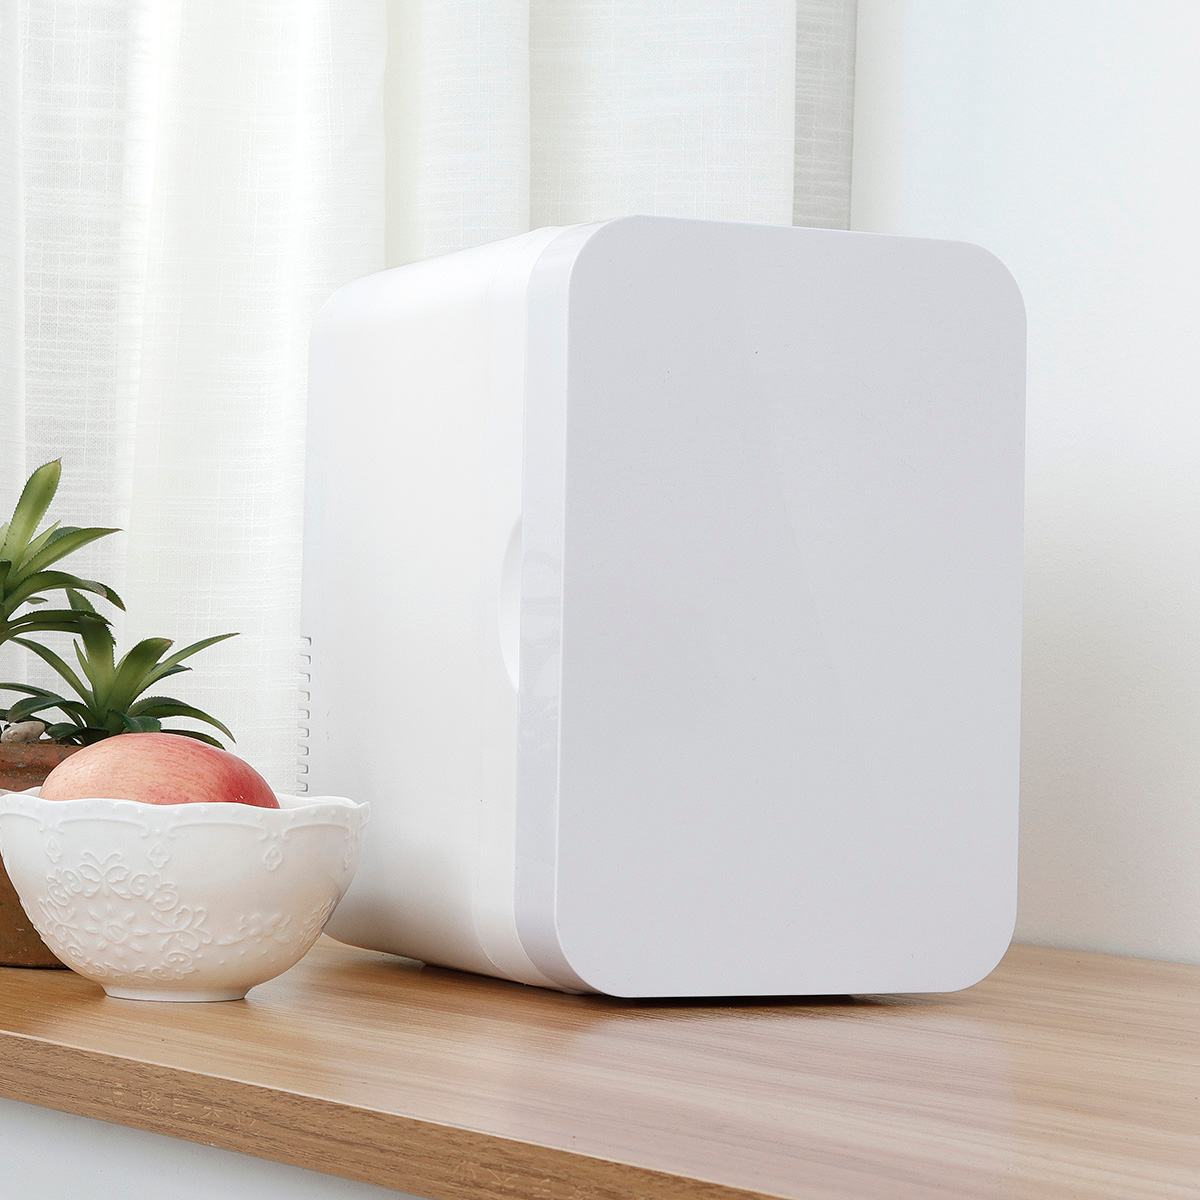 AUGIENB 6L Mini Refrigerator Small Household Dormitory Single Door Car Home Dual-use Car Refrigerator Dual Use Car Use 24V 12V